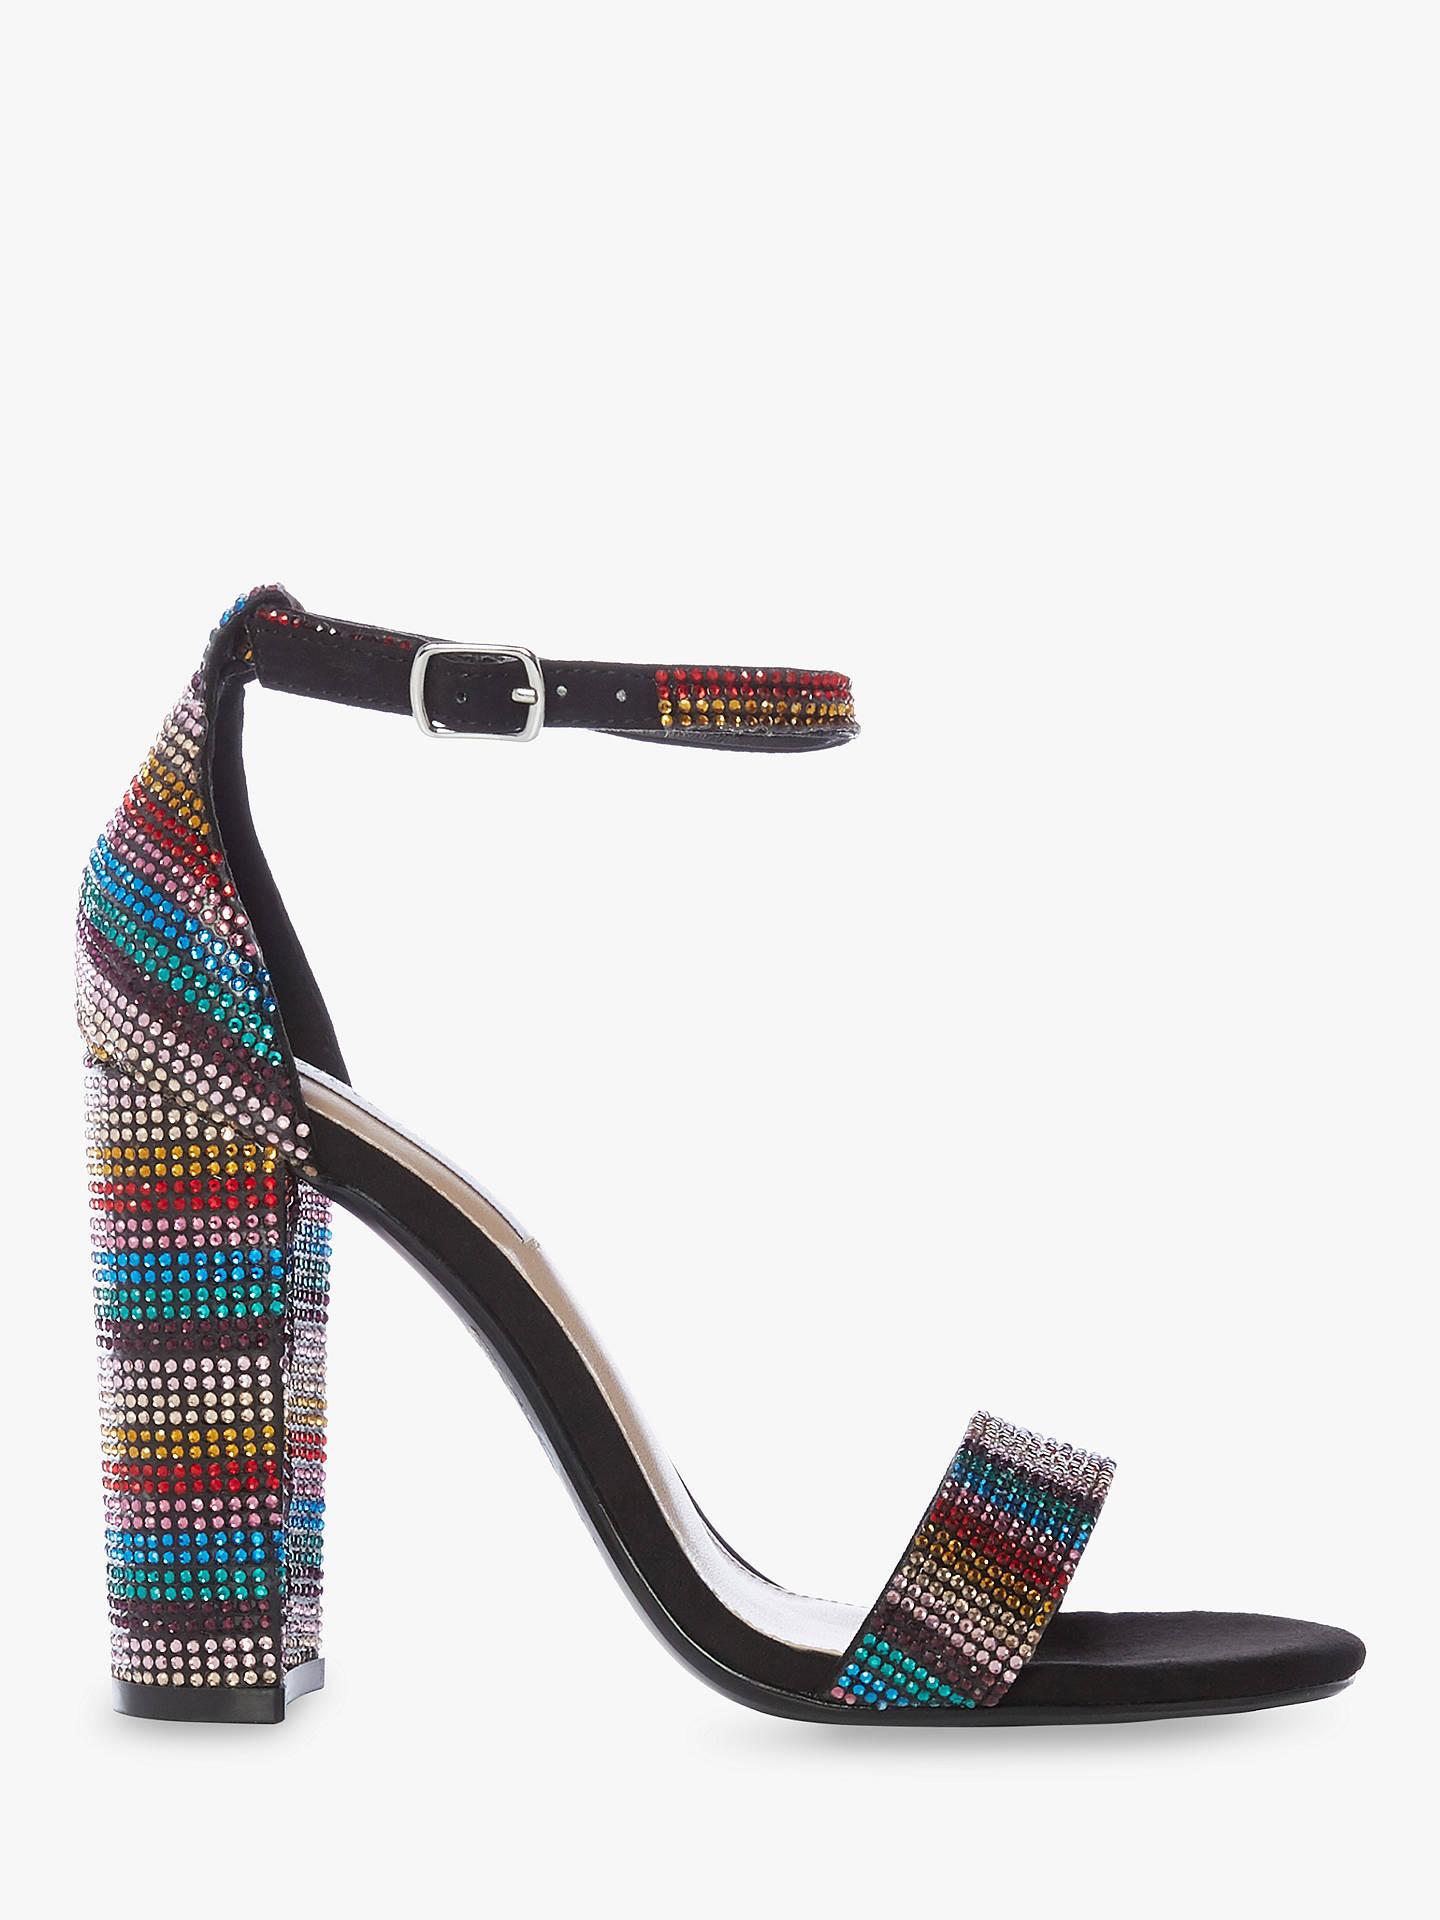 d23216c9d23 Steve Madden Carrson Two Part Block Heel Sandals, Multi